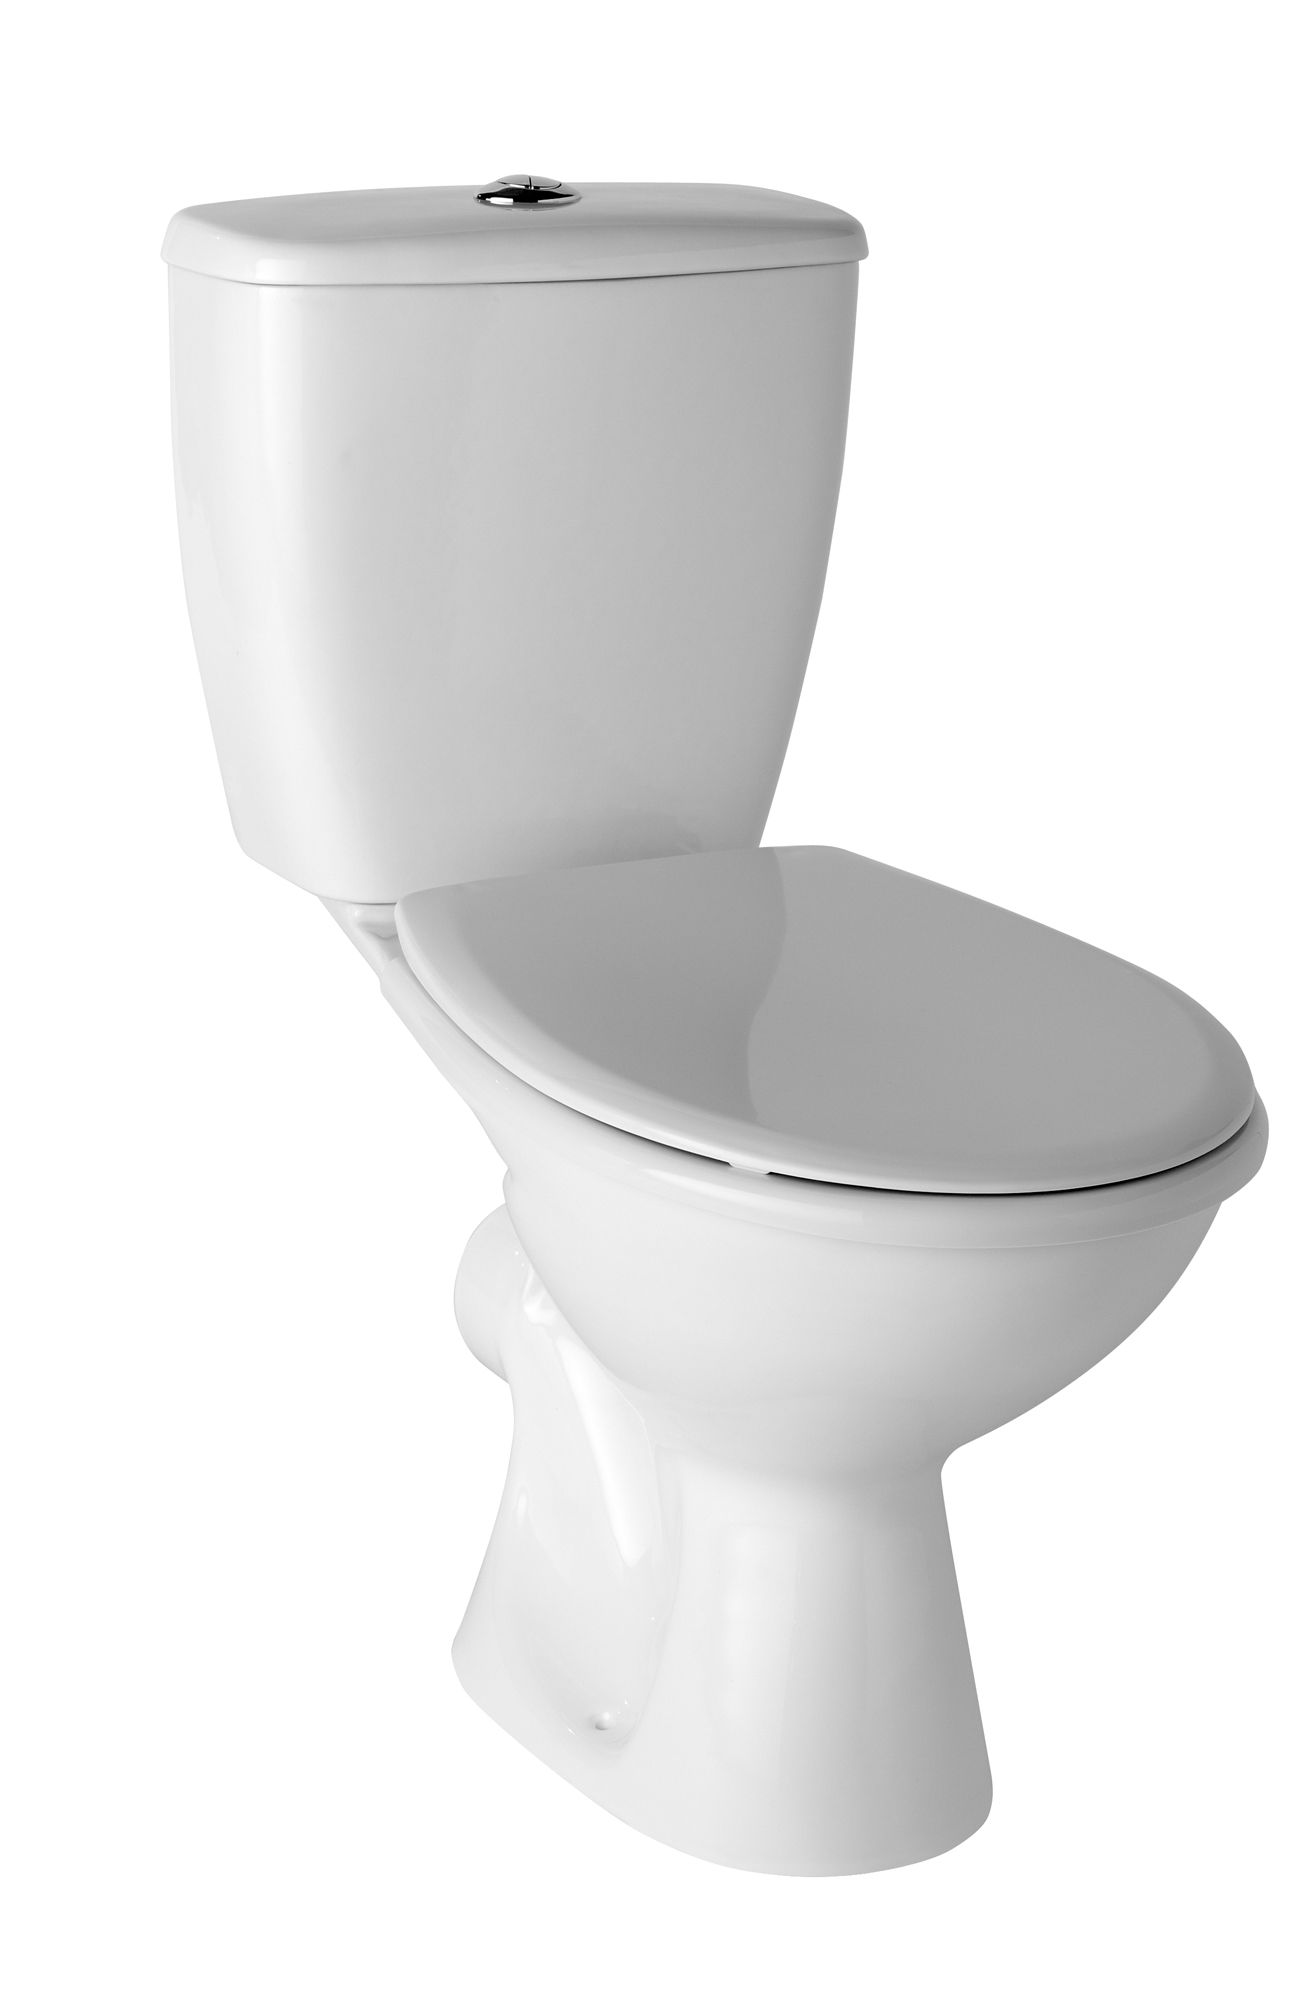 Plumbsure Newbury Close Coupled Toilet With Standard Close